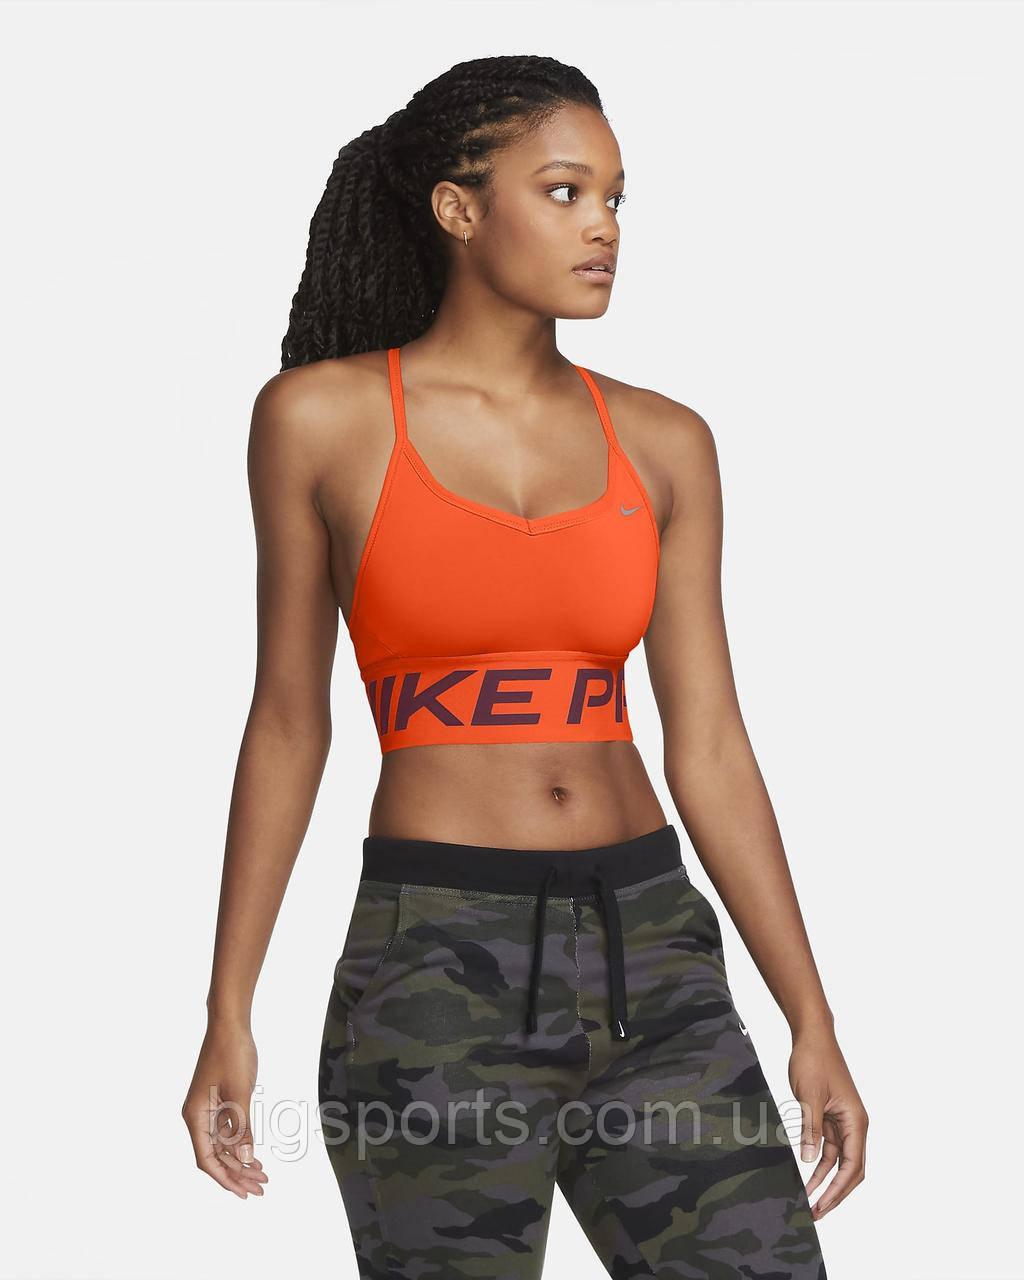 Топ жен. Nike Pro Indy (арт. CT3764-891)